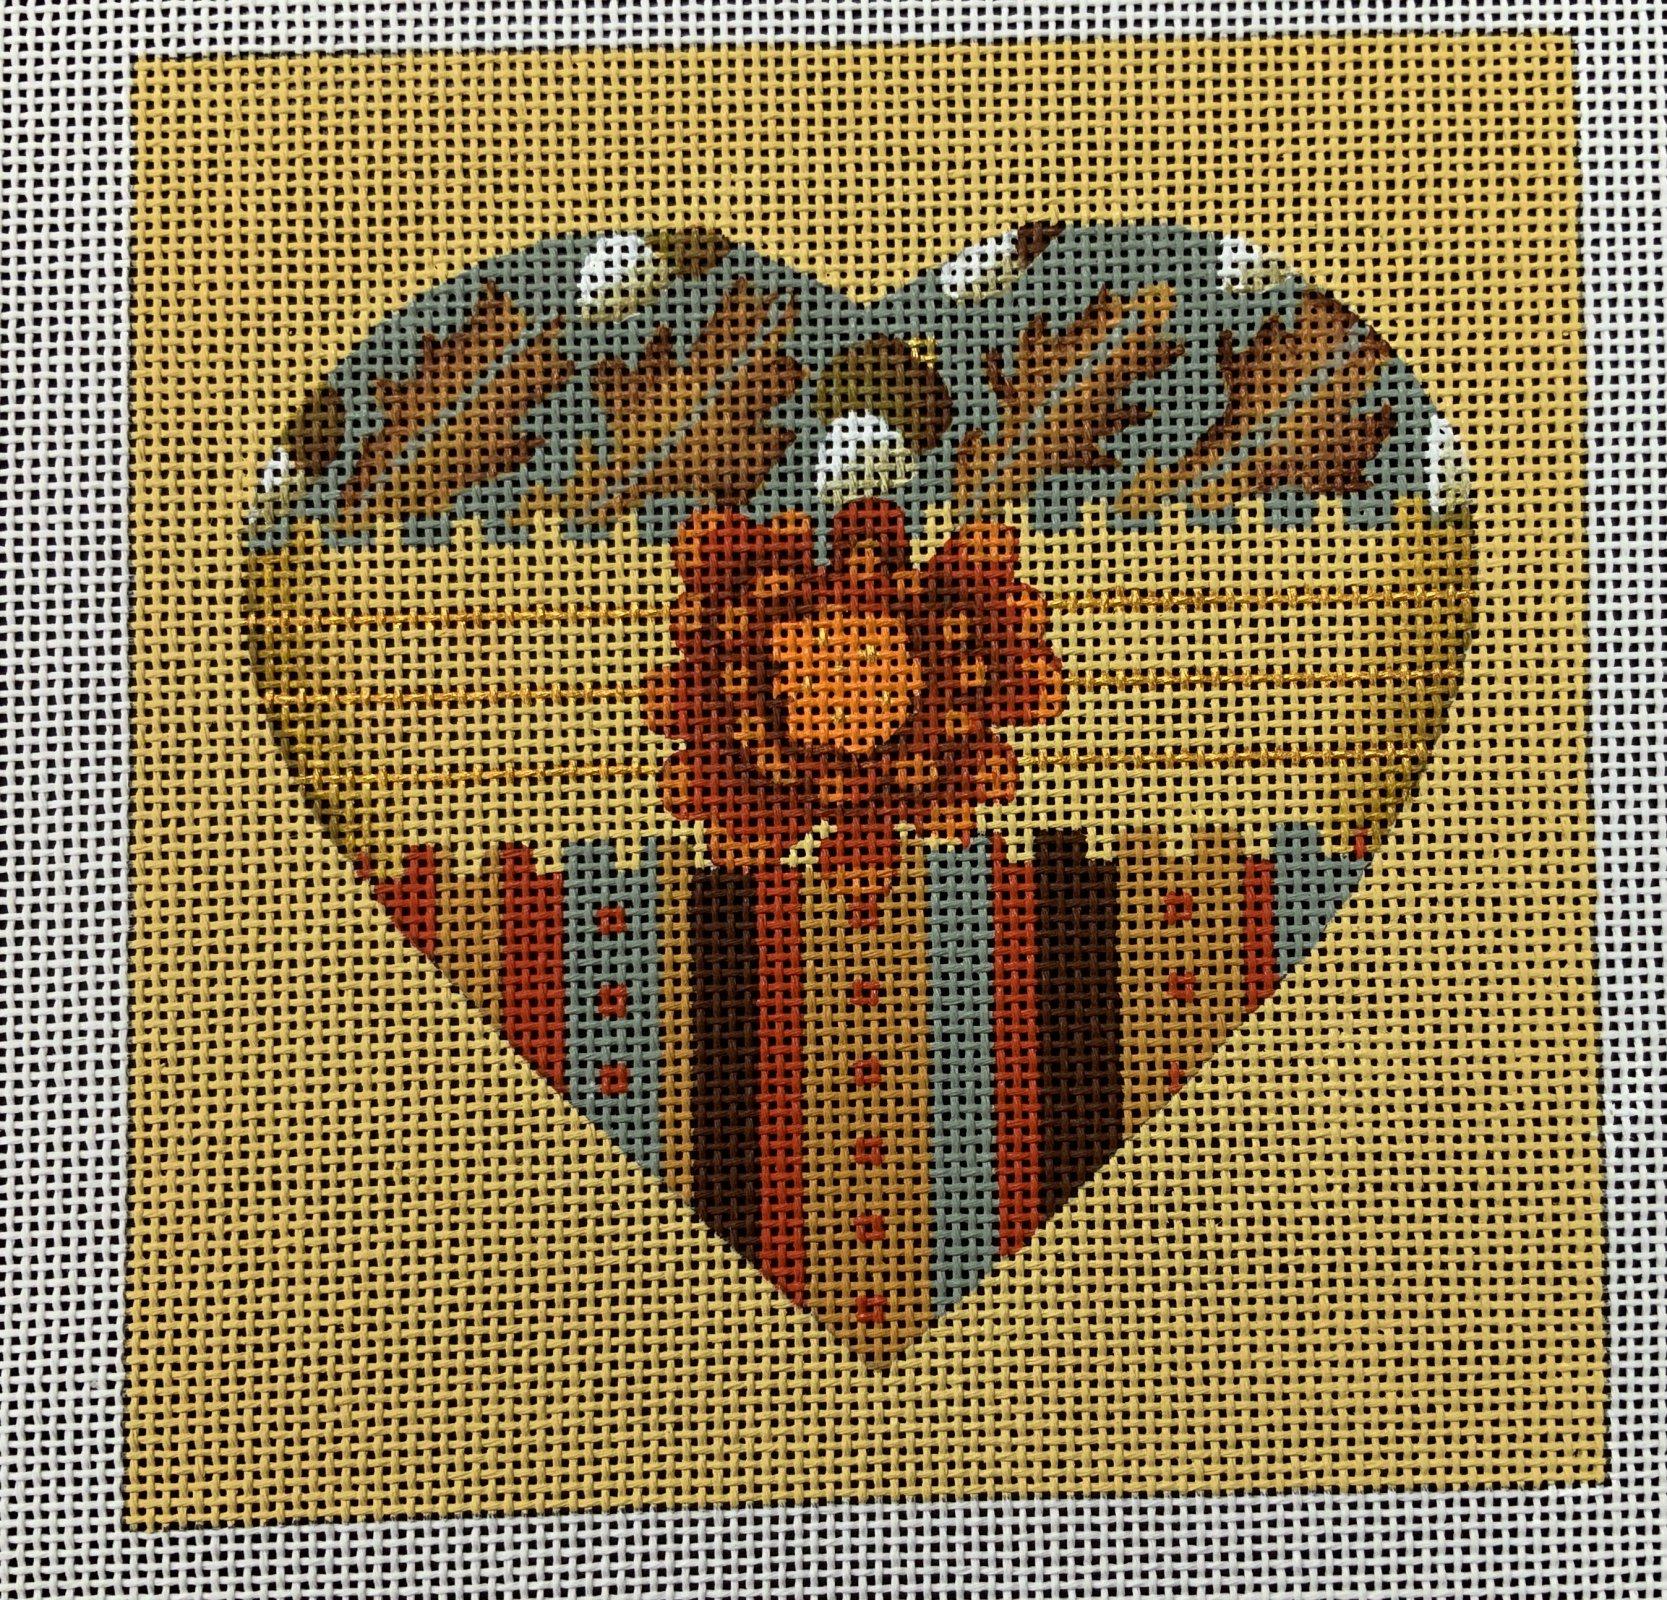 Acorn Heart,13 ct.,7x7